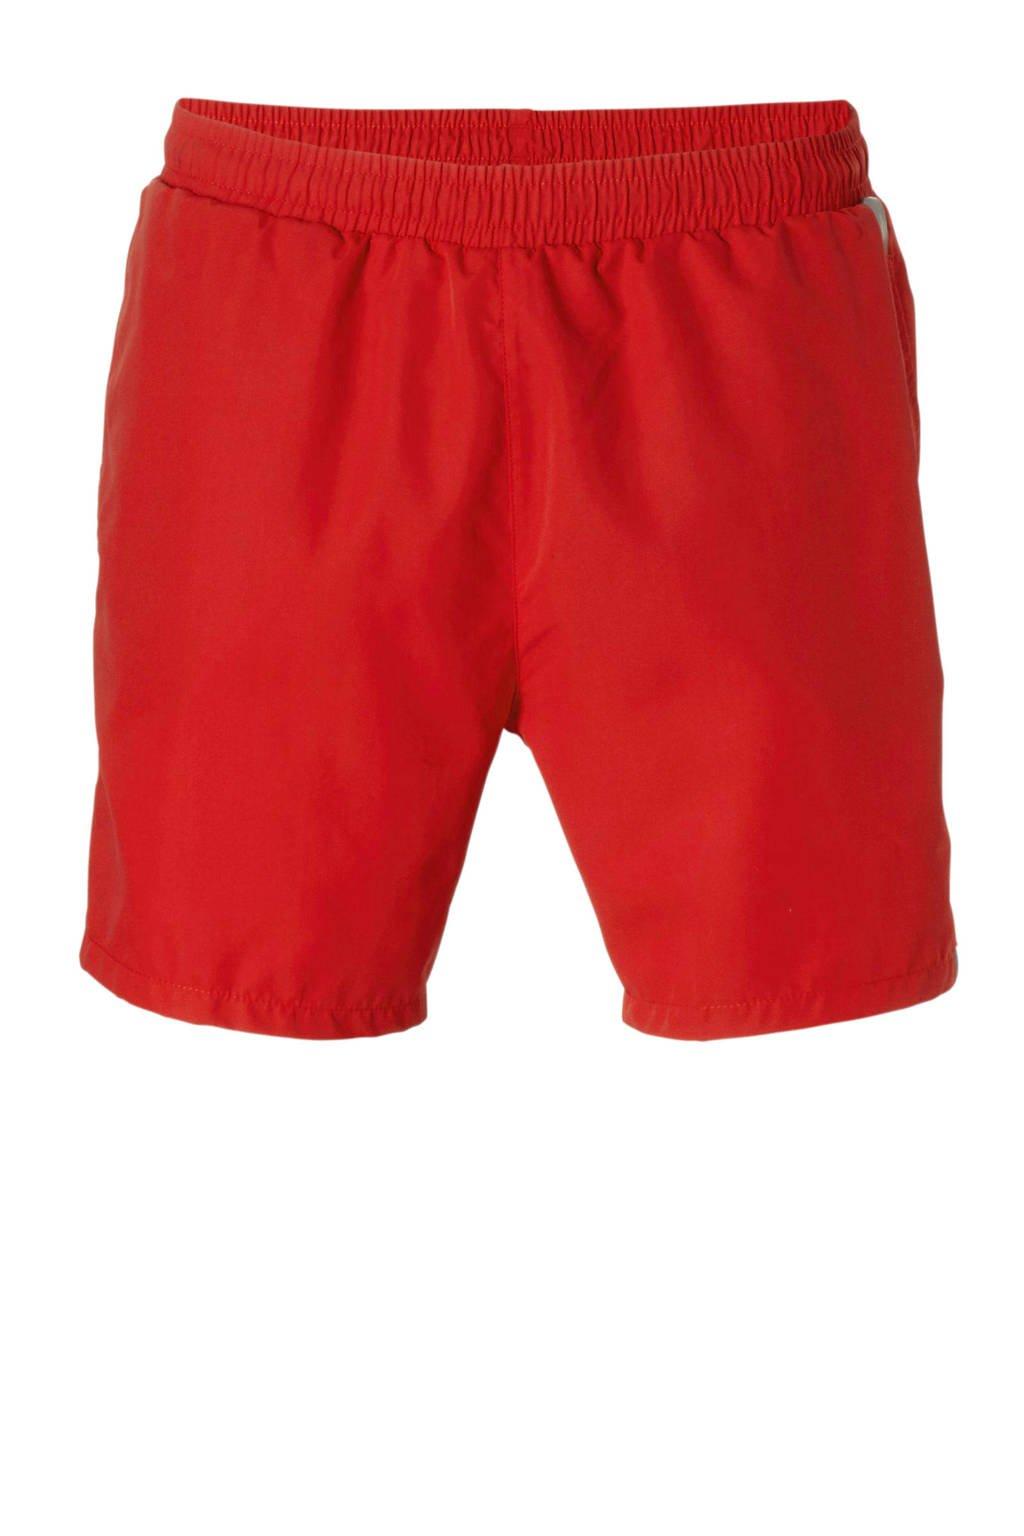 BOSS zwemshort rood, Rood